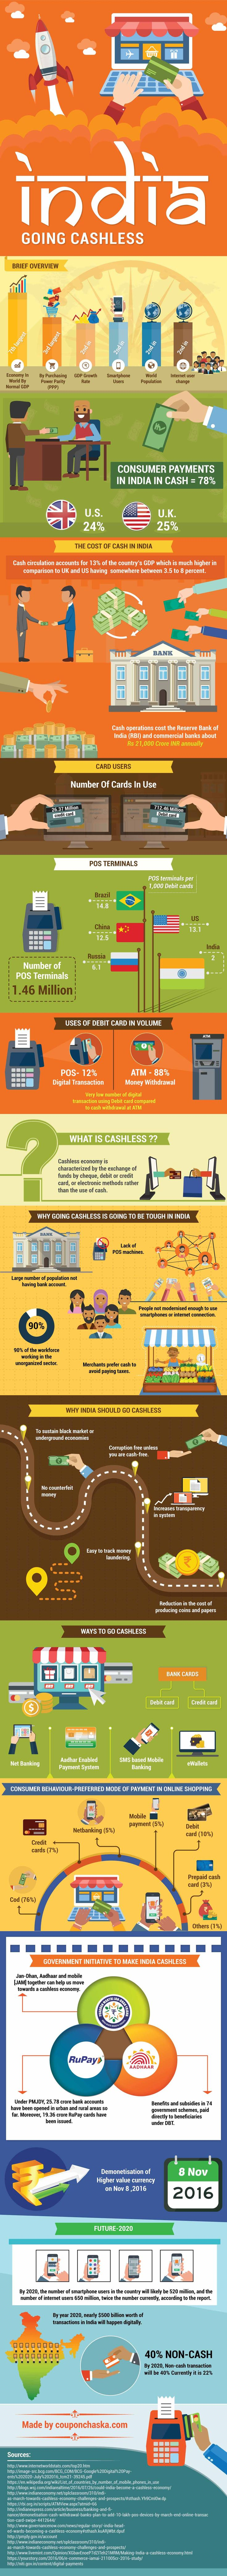 Future and Scope of Cashless Economy in India